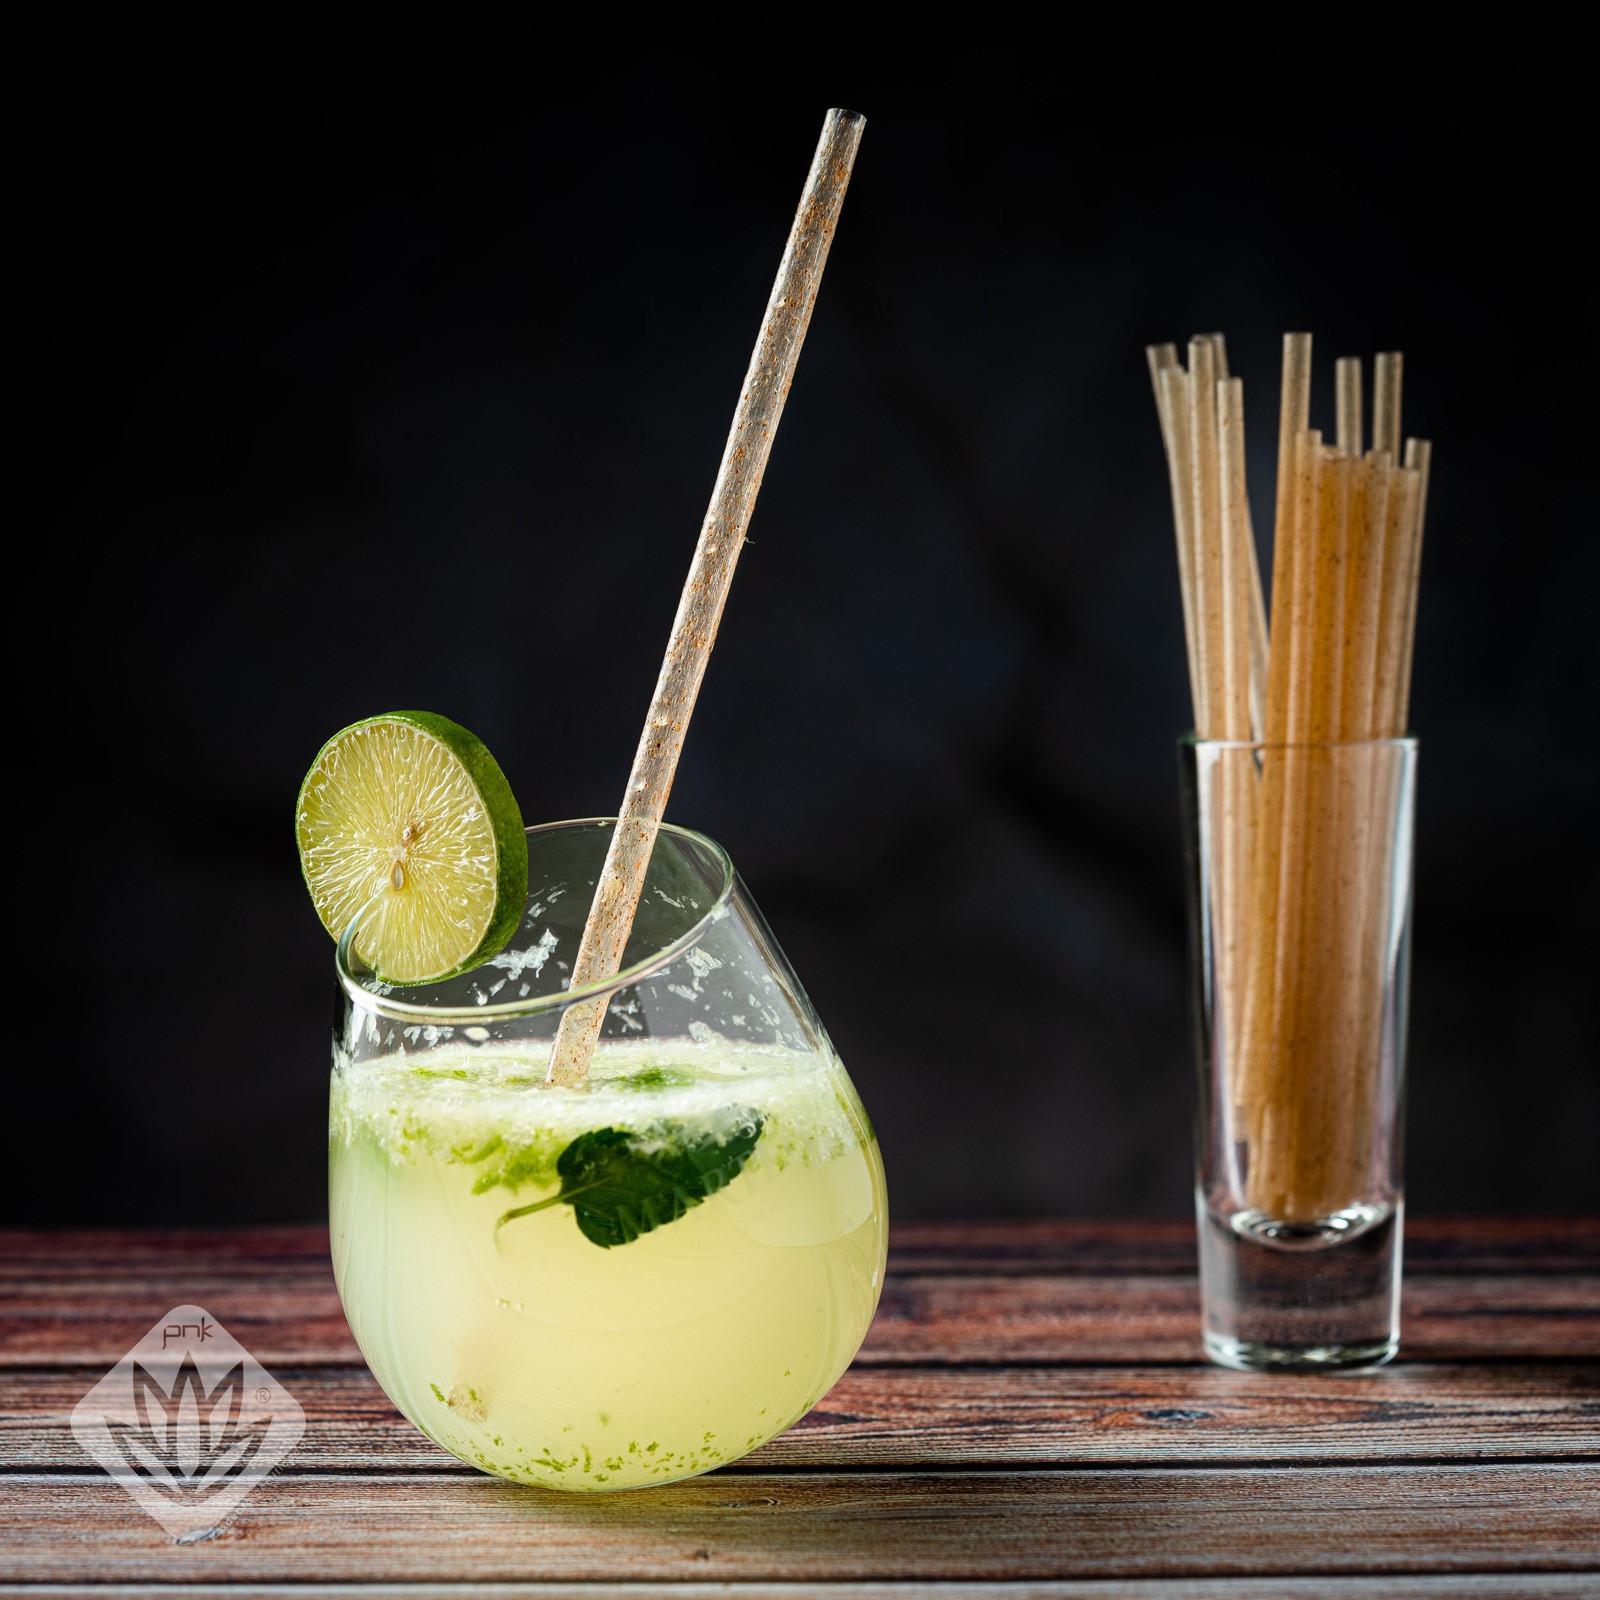 Agave Fiber Drinking Straw